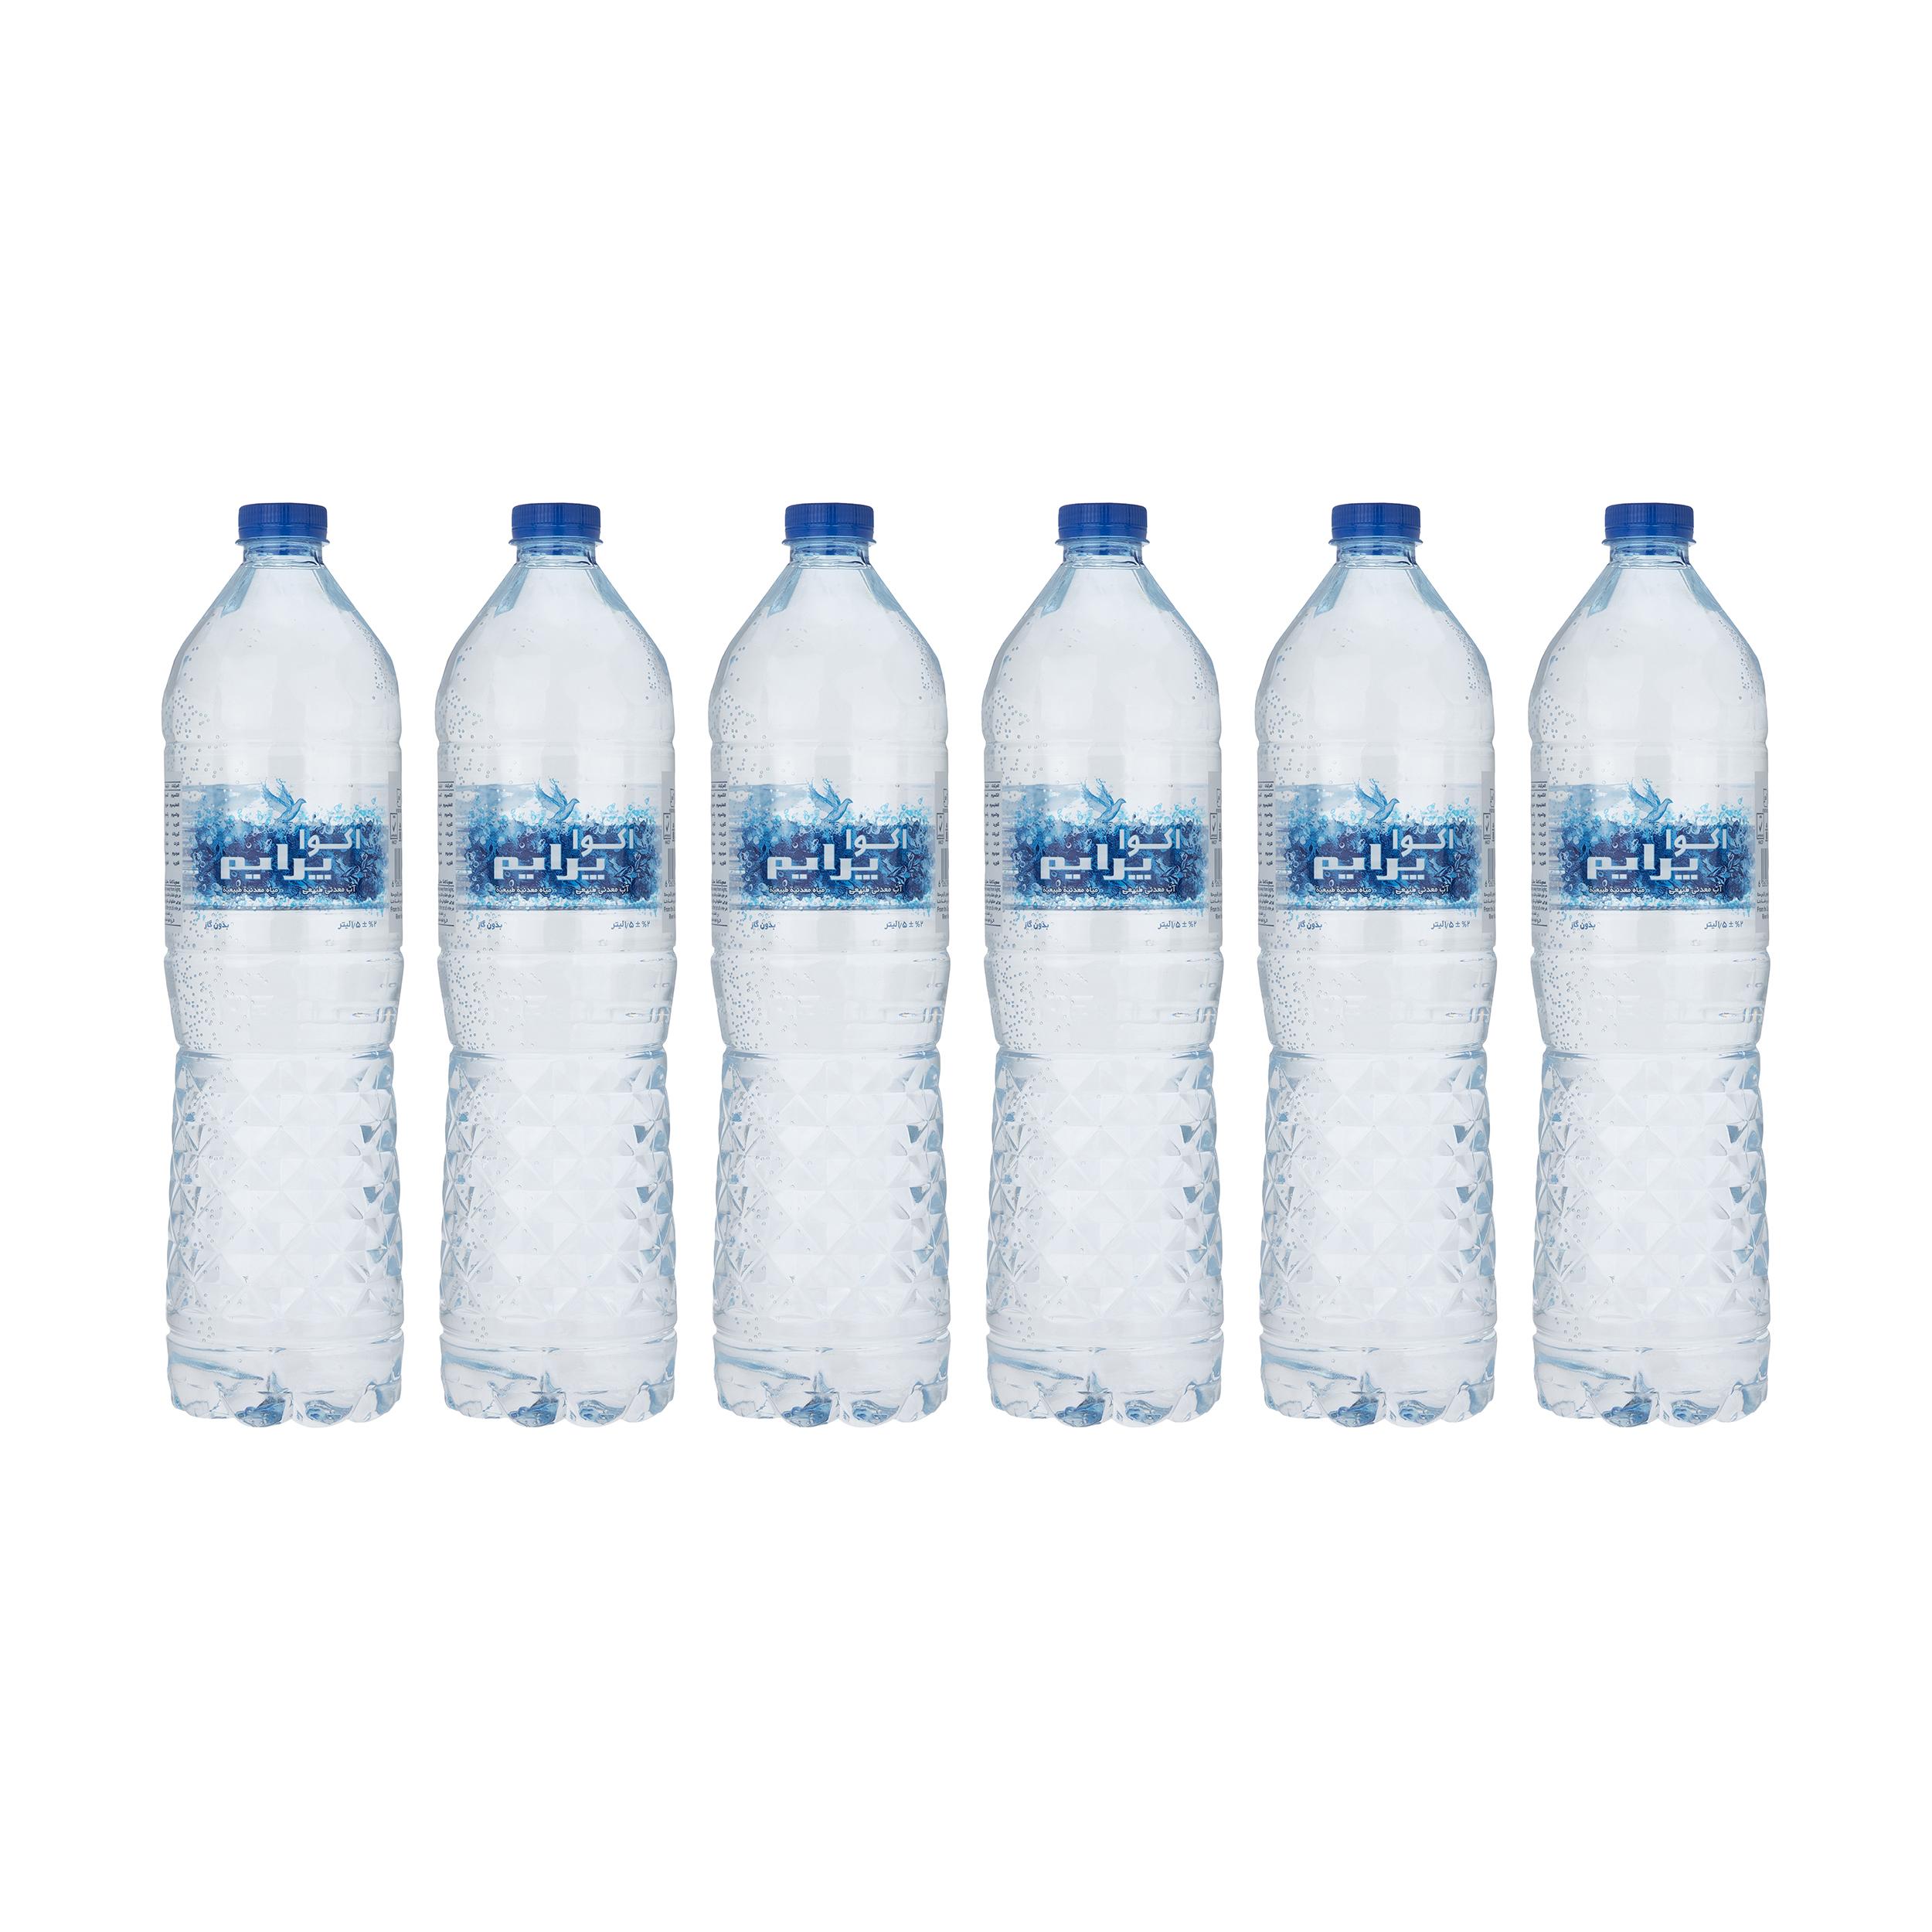 آب معدنی آکوا پرایم -1500 میلی لیتر بسته 6 عددی